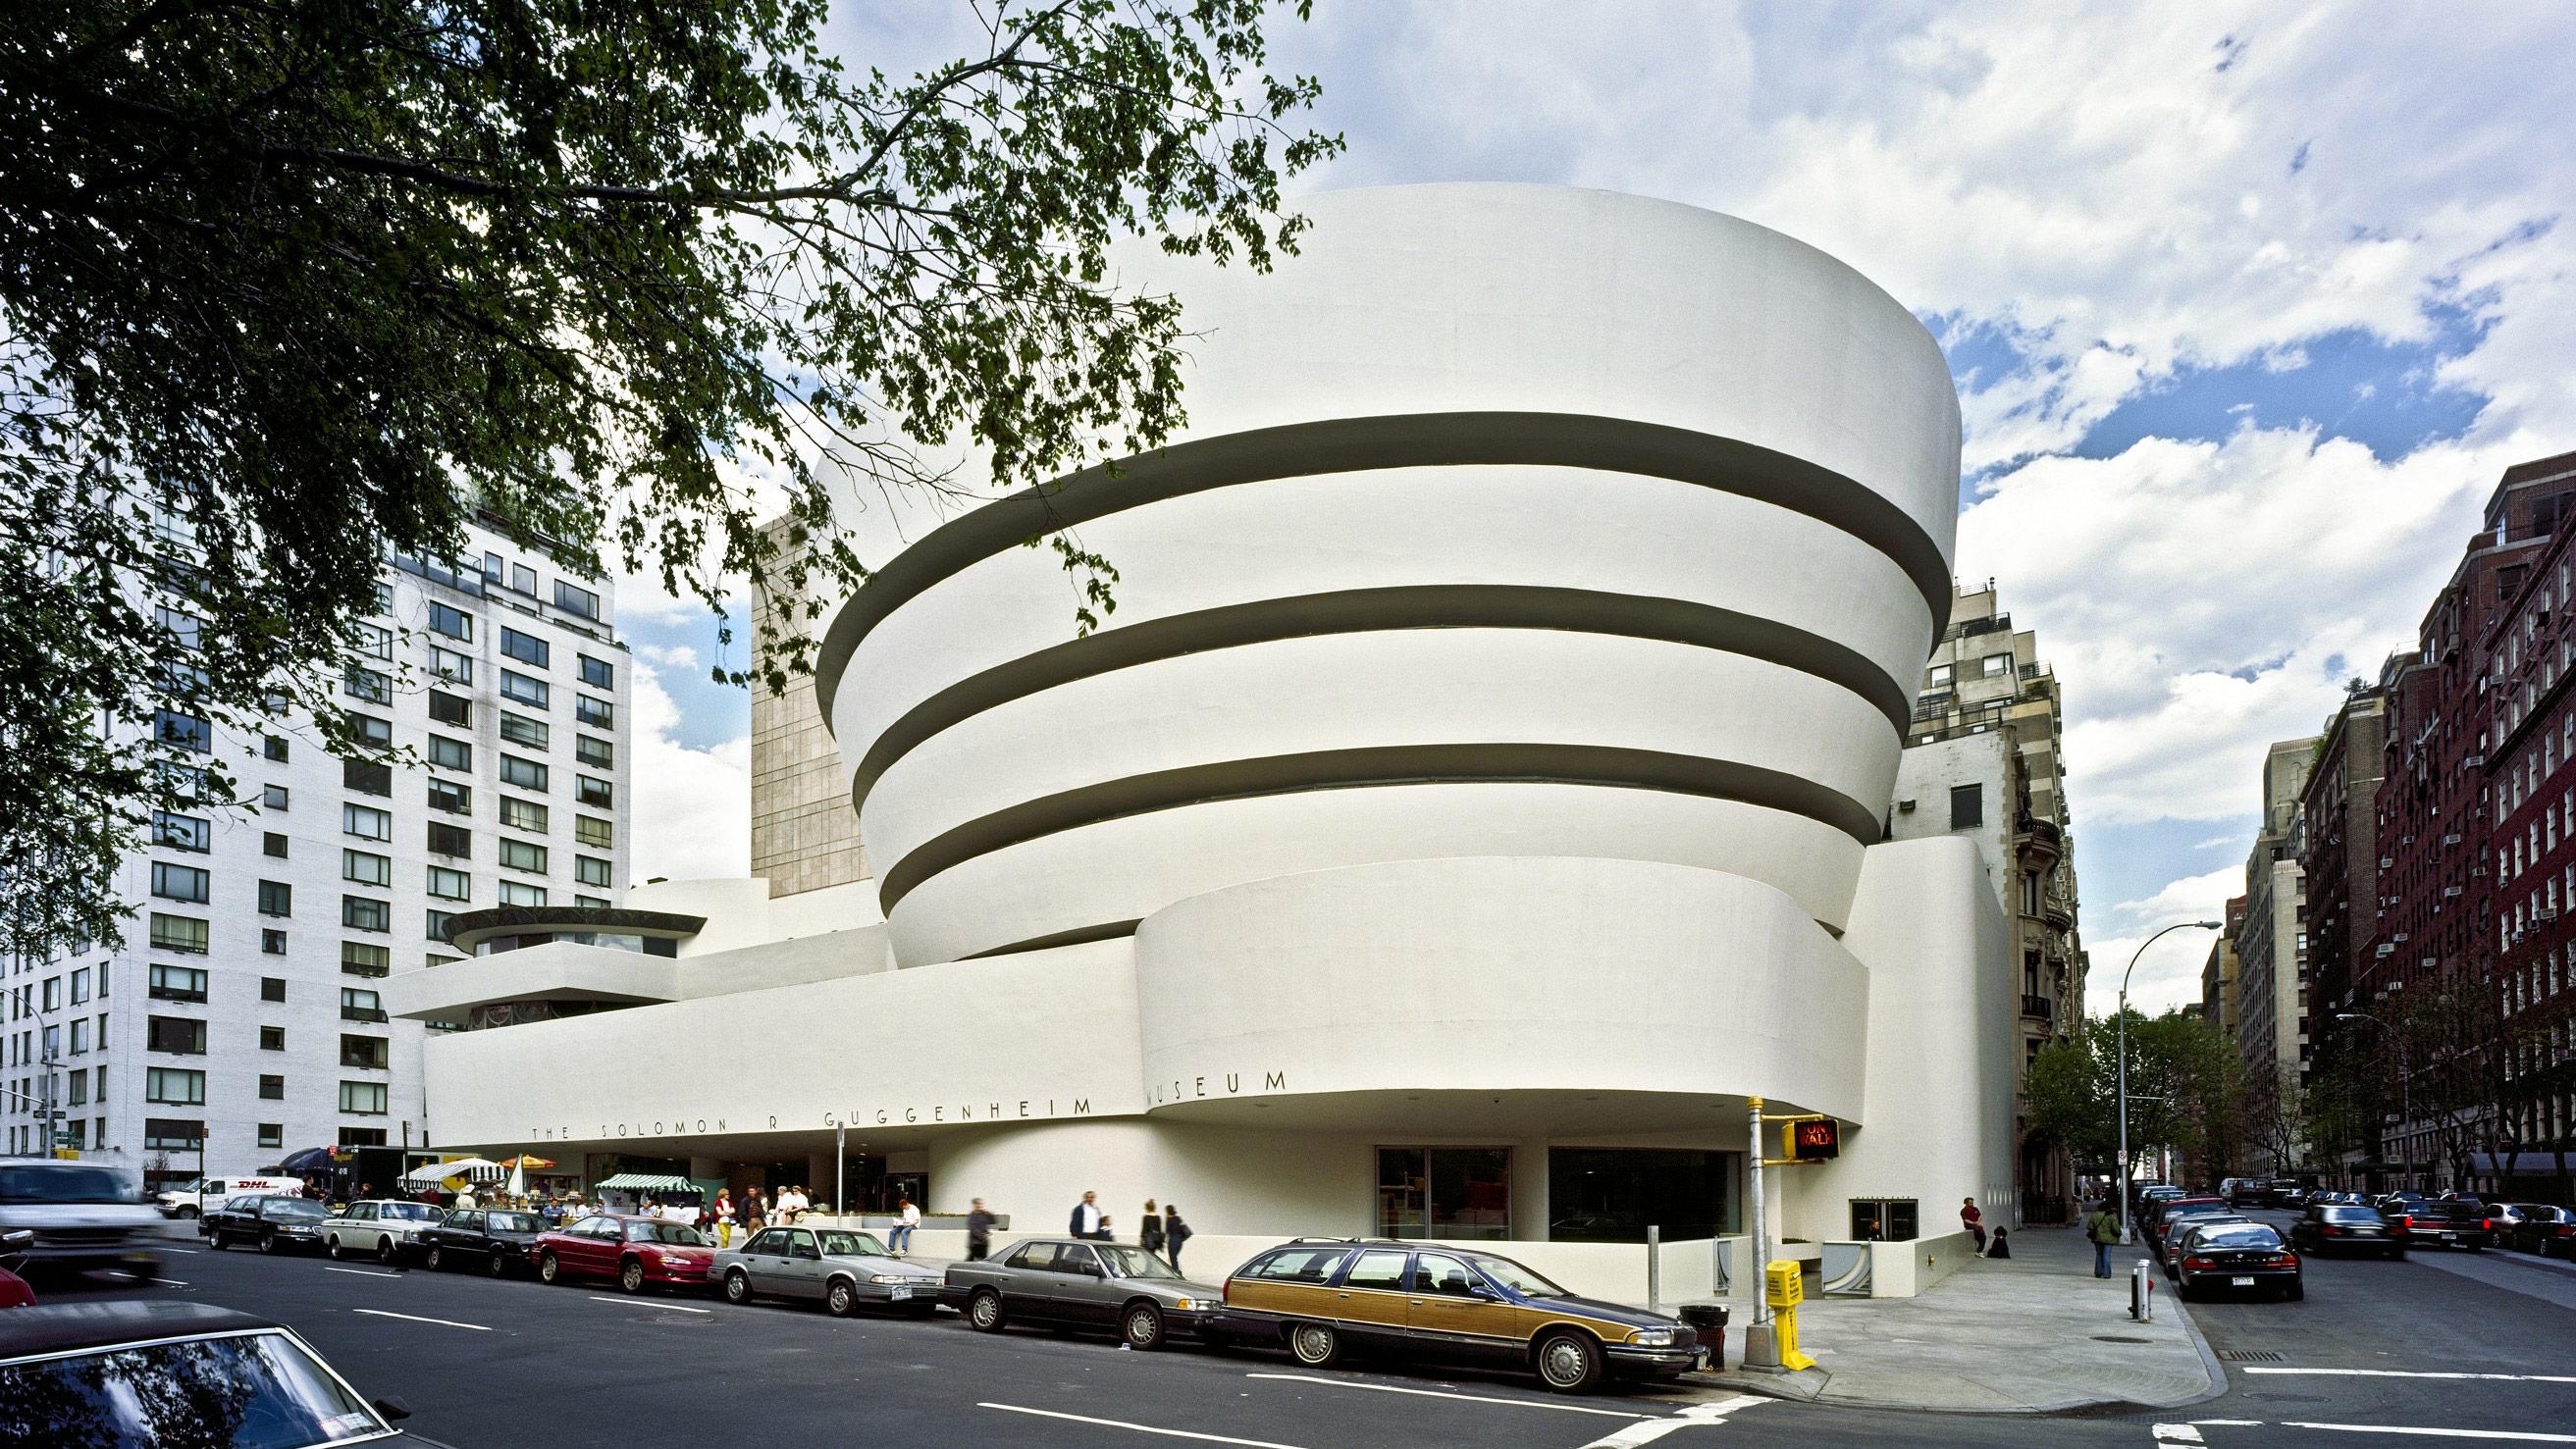 Exterior View Of The Solomon R. Guggenheim Museum ...